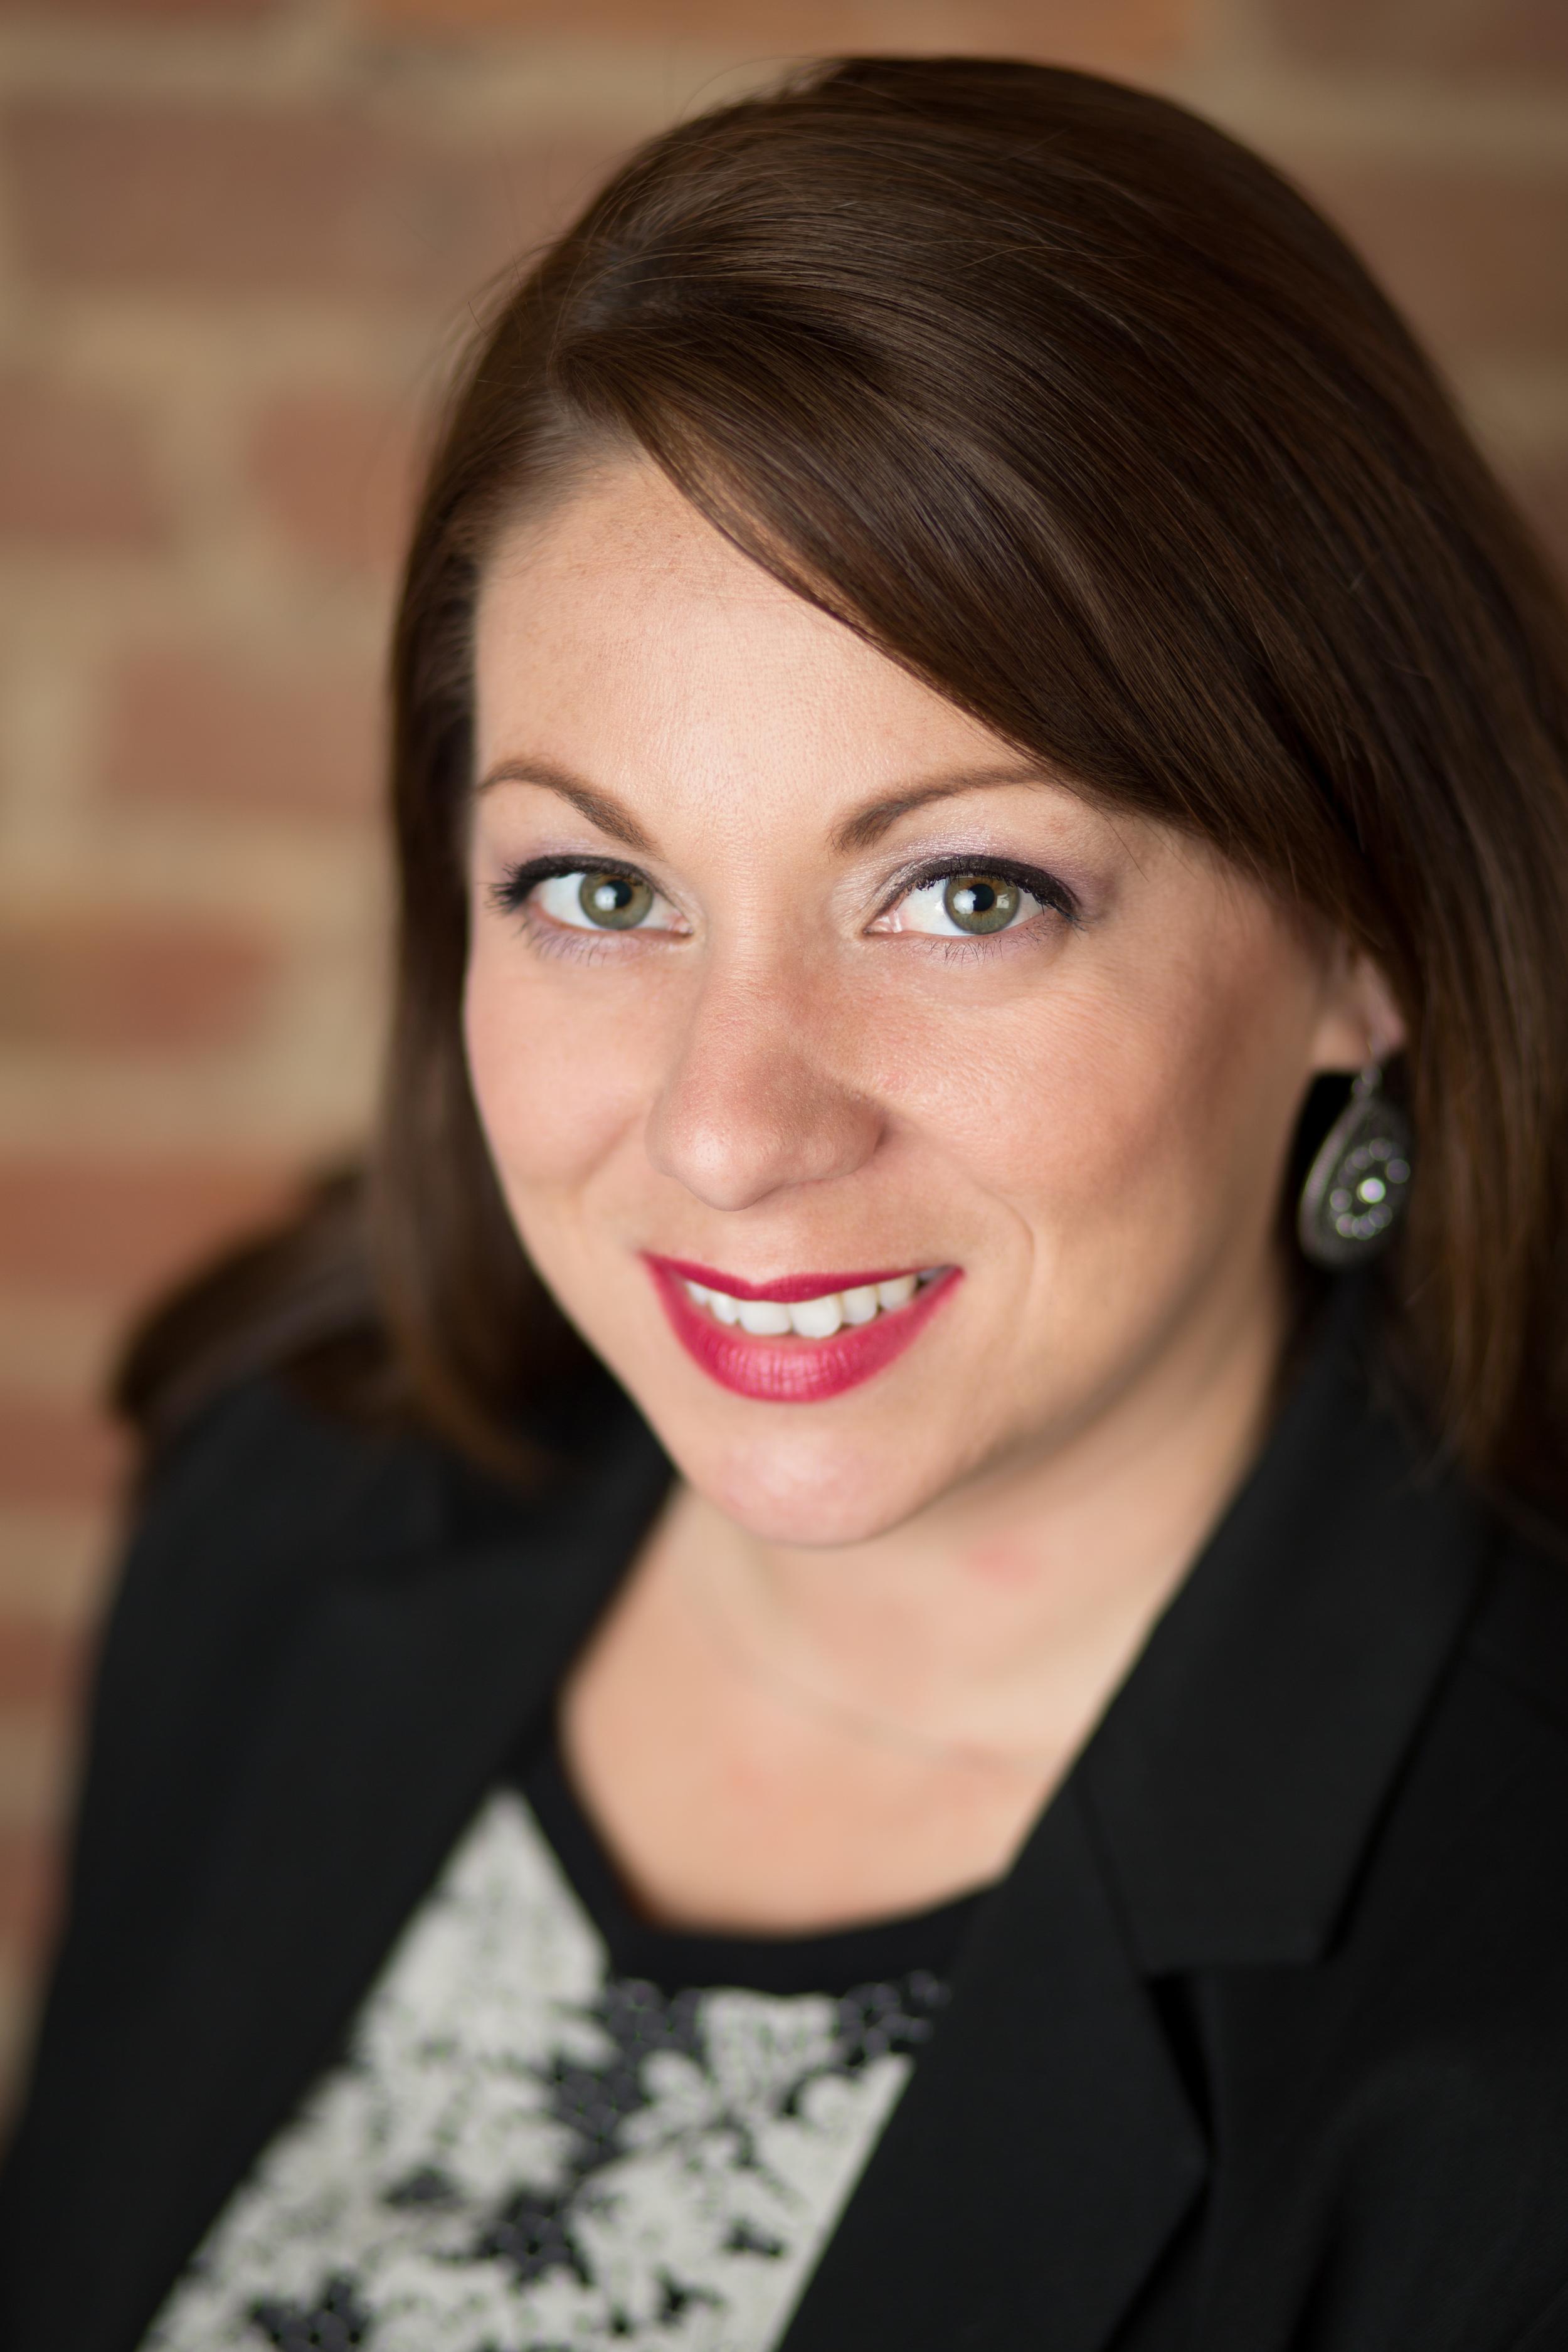 Michelle Nikitaras - Owner/Lead Event Planner